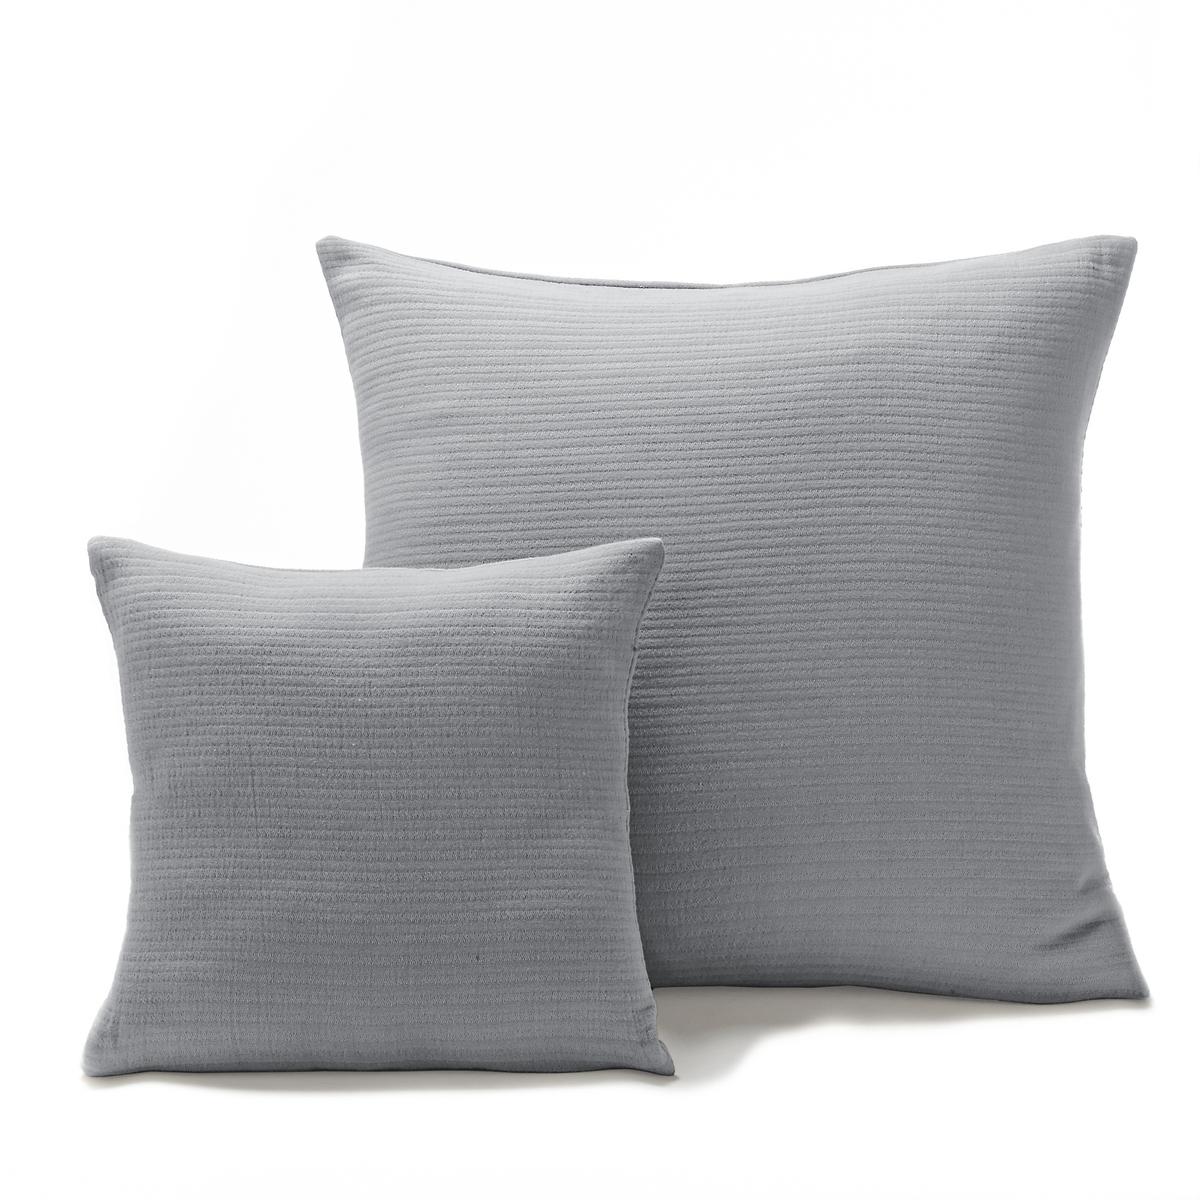 лучшая цена Наволочка La Redoute На подушку-валик или наволочка на подушку ILHOW 40 x 40 см серый